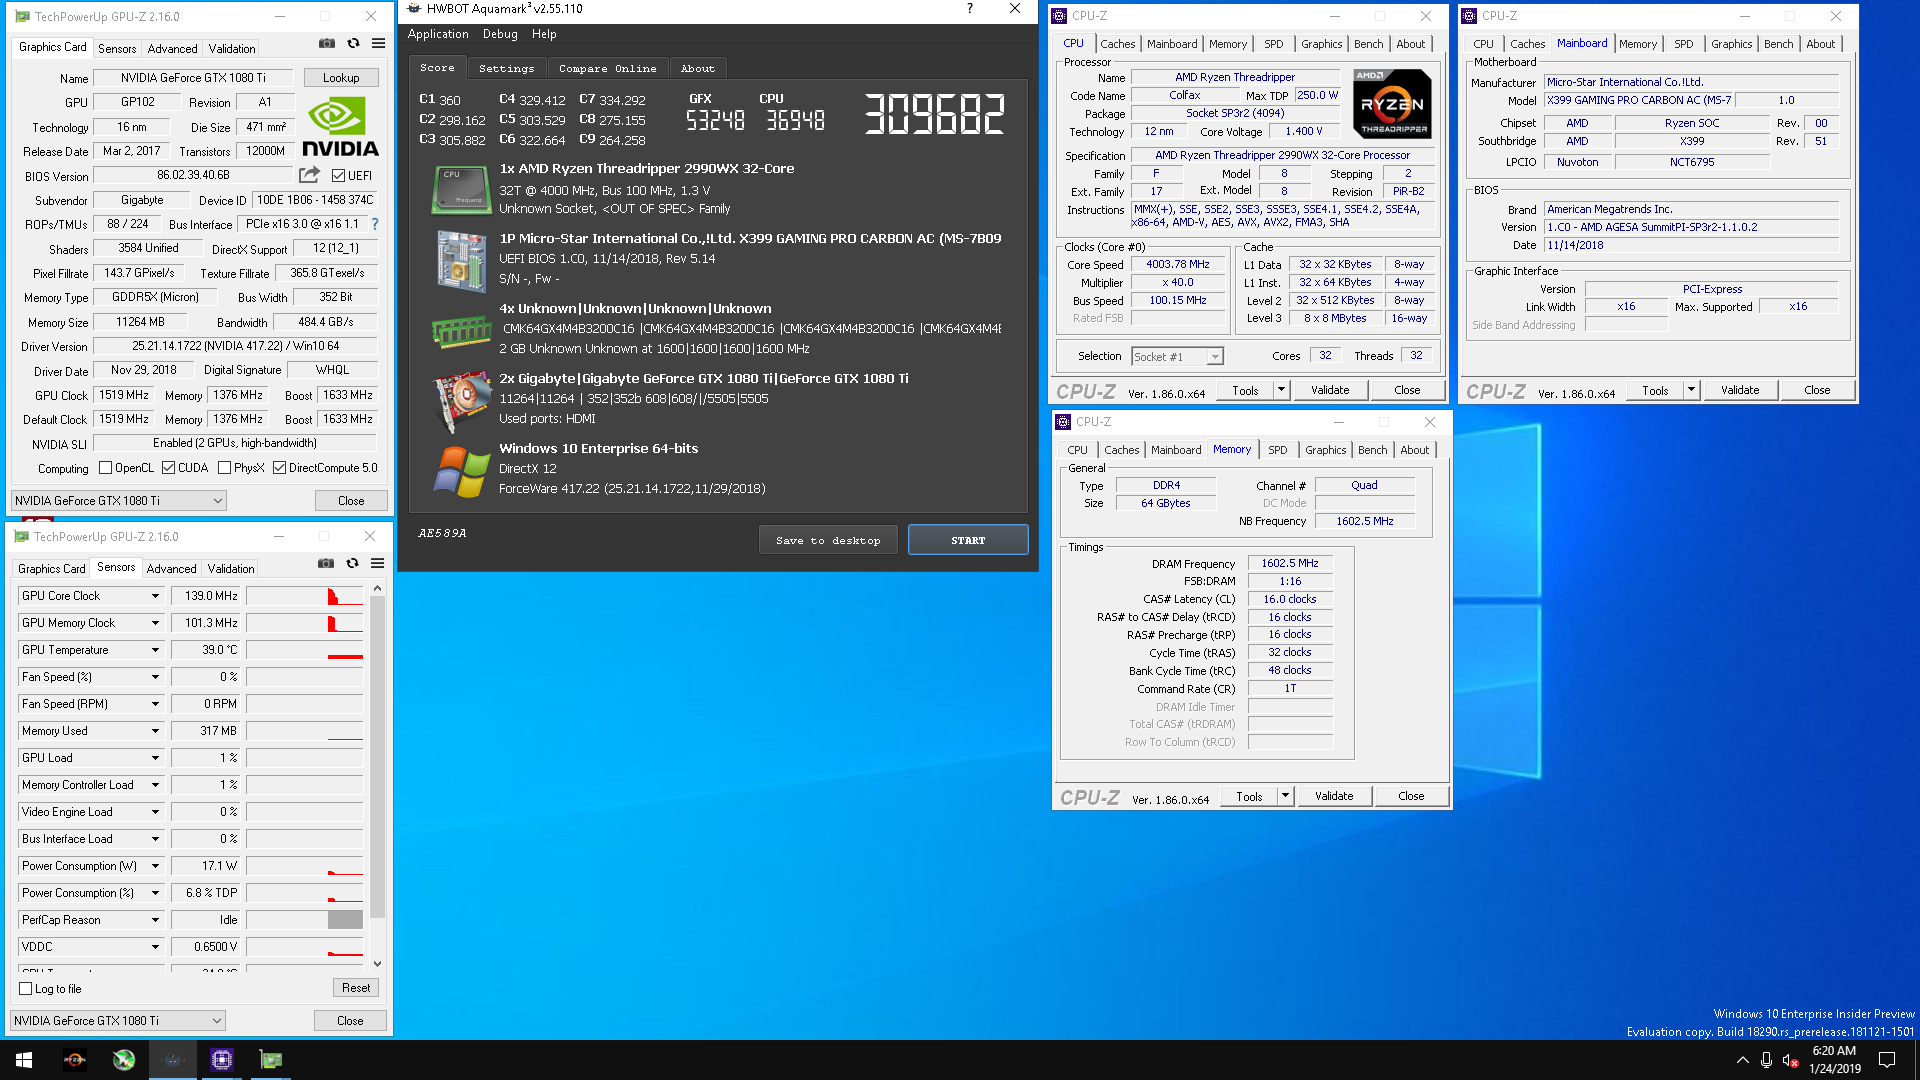 GB-Perth`s Aquamark score: 309682 marks with a GeForce GTX